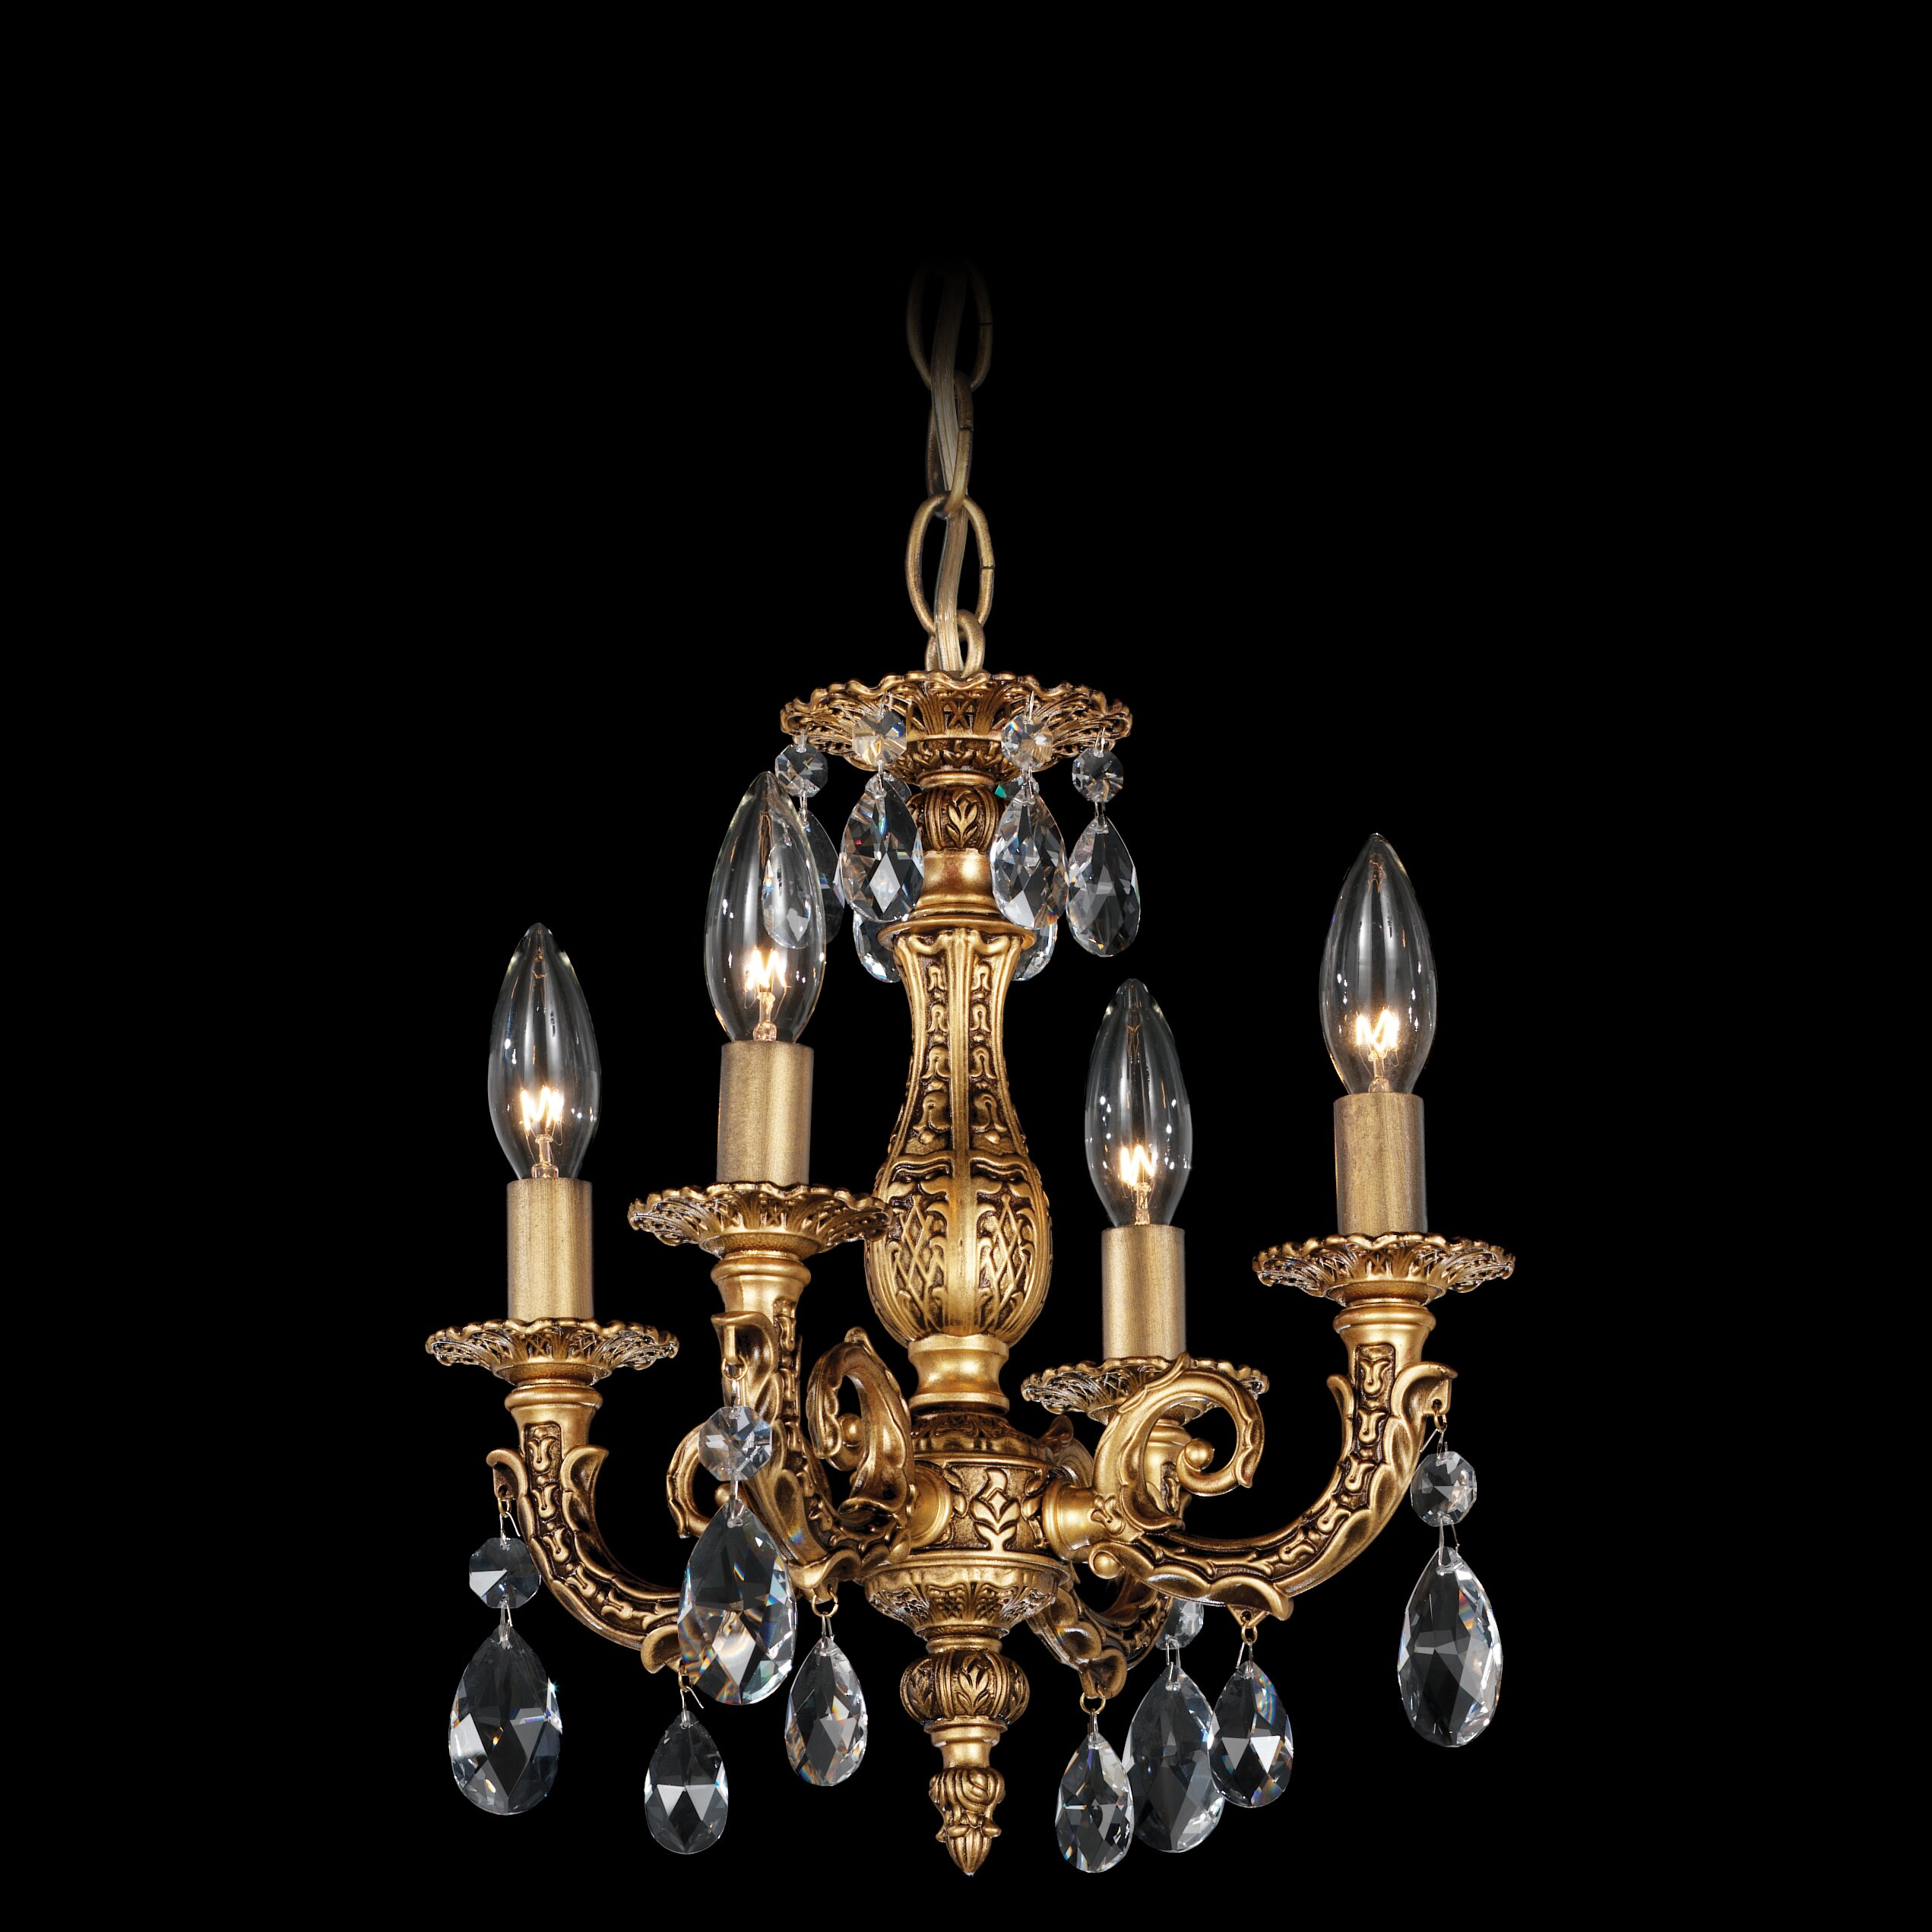 Schonbek Chandelier Wayfair: Schonbek Milano 4-Light Candle-Style Chandelier & Reviews